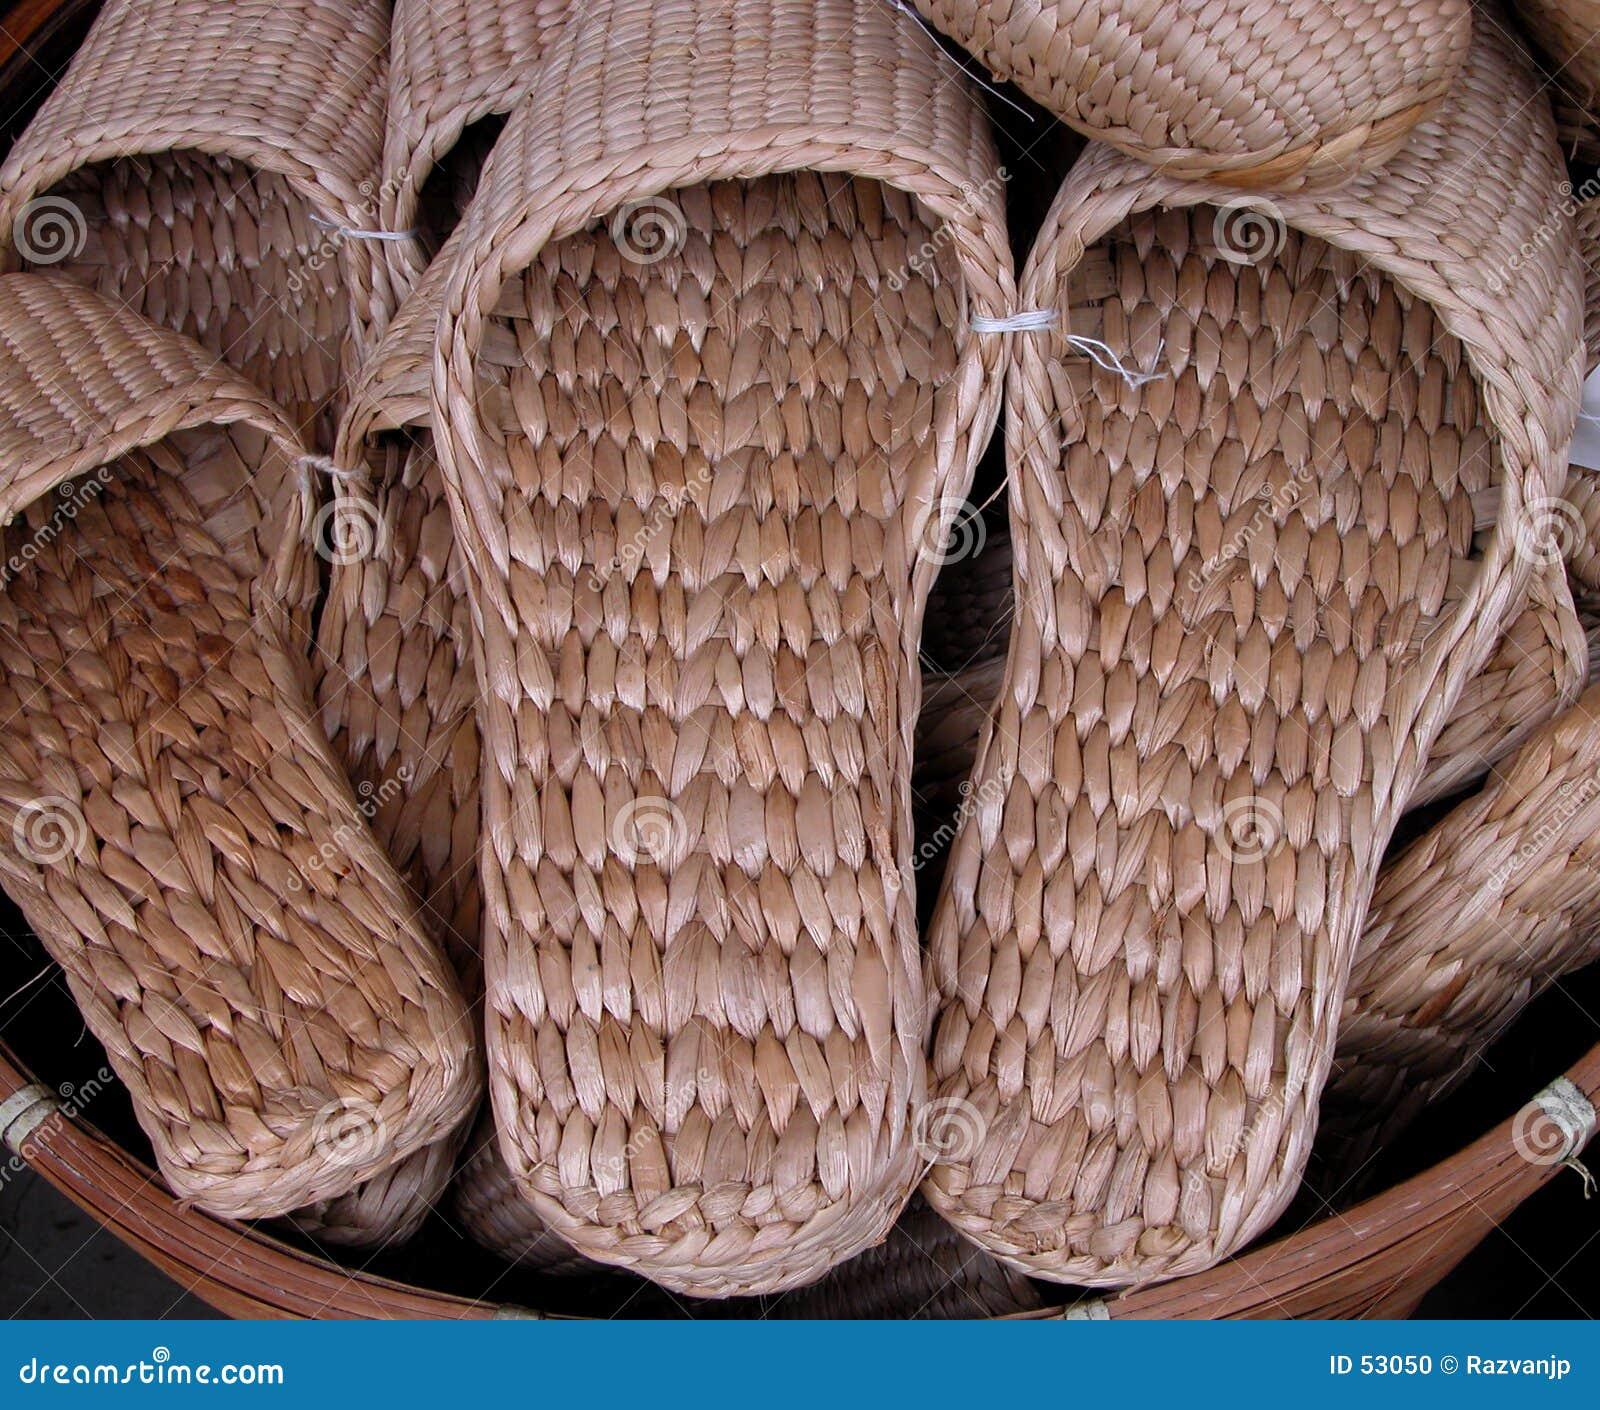 Straws slippers